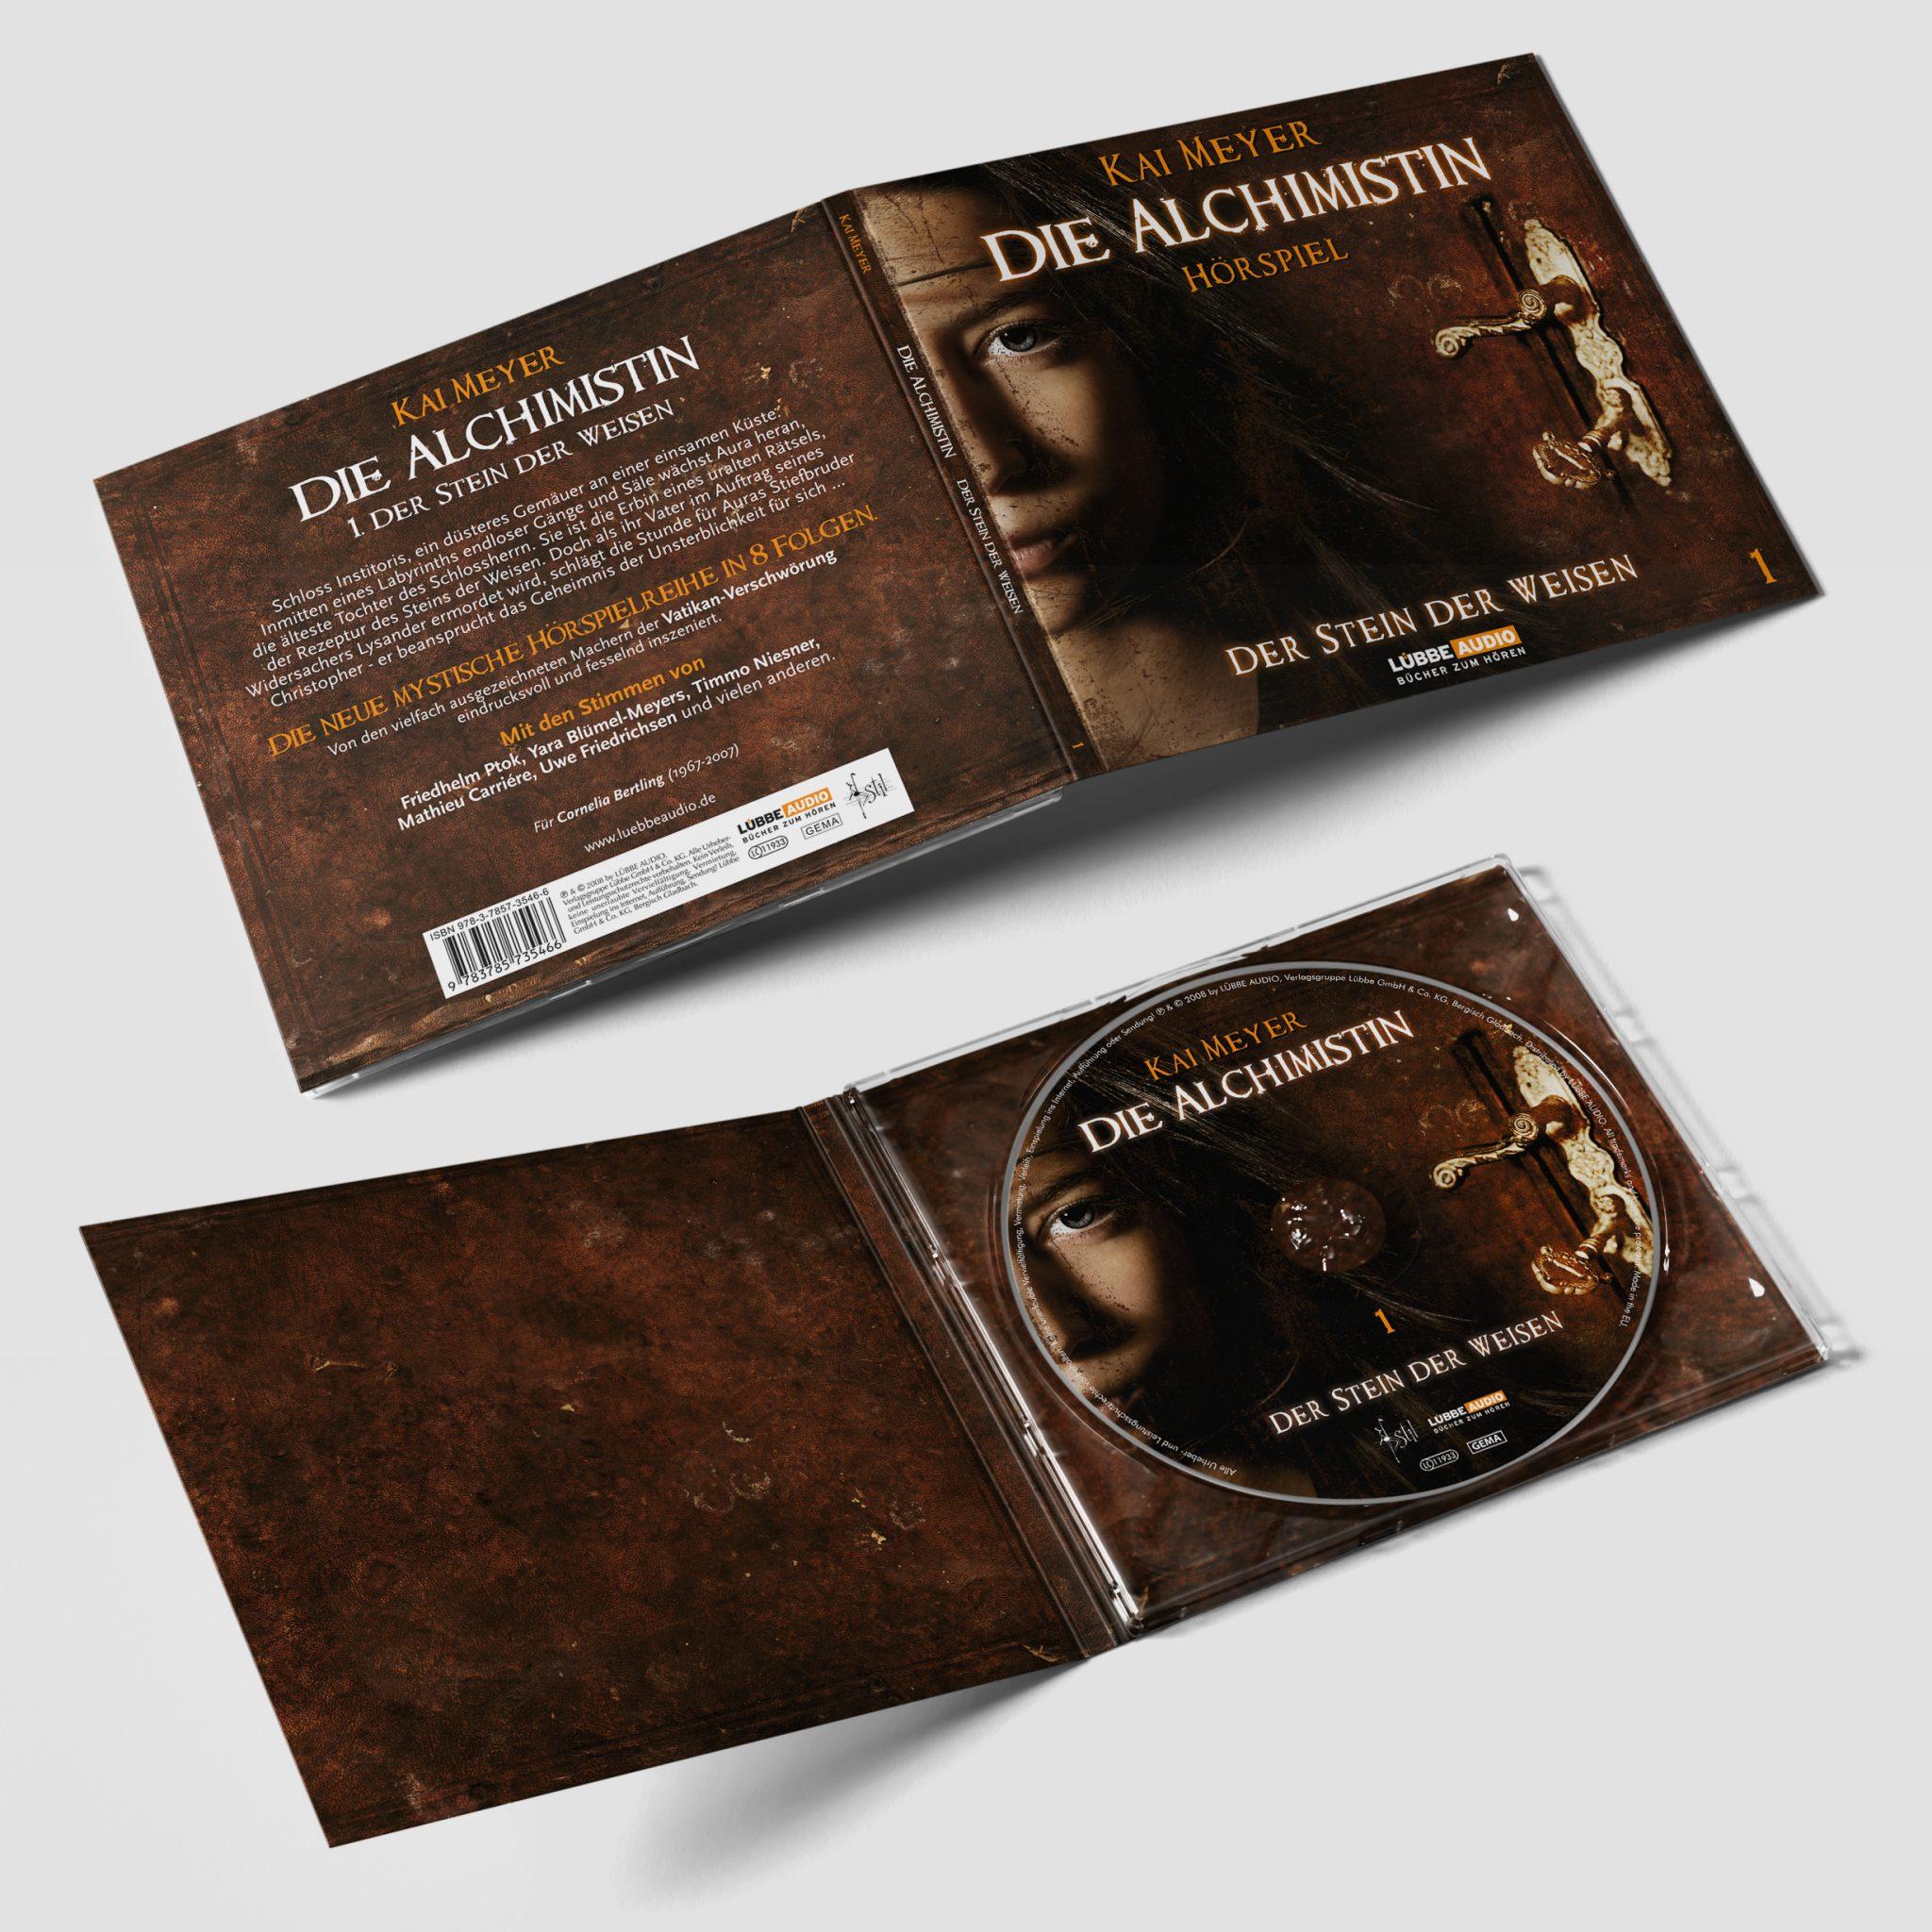 die alchimistin_luebbe-1